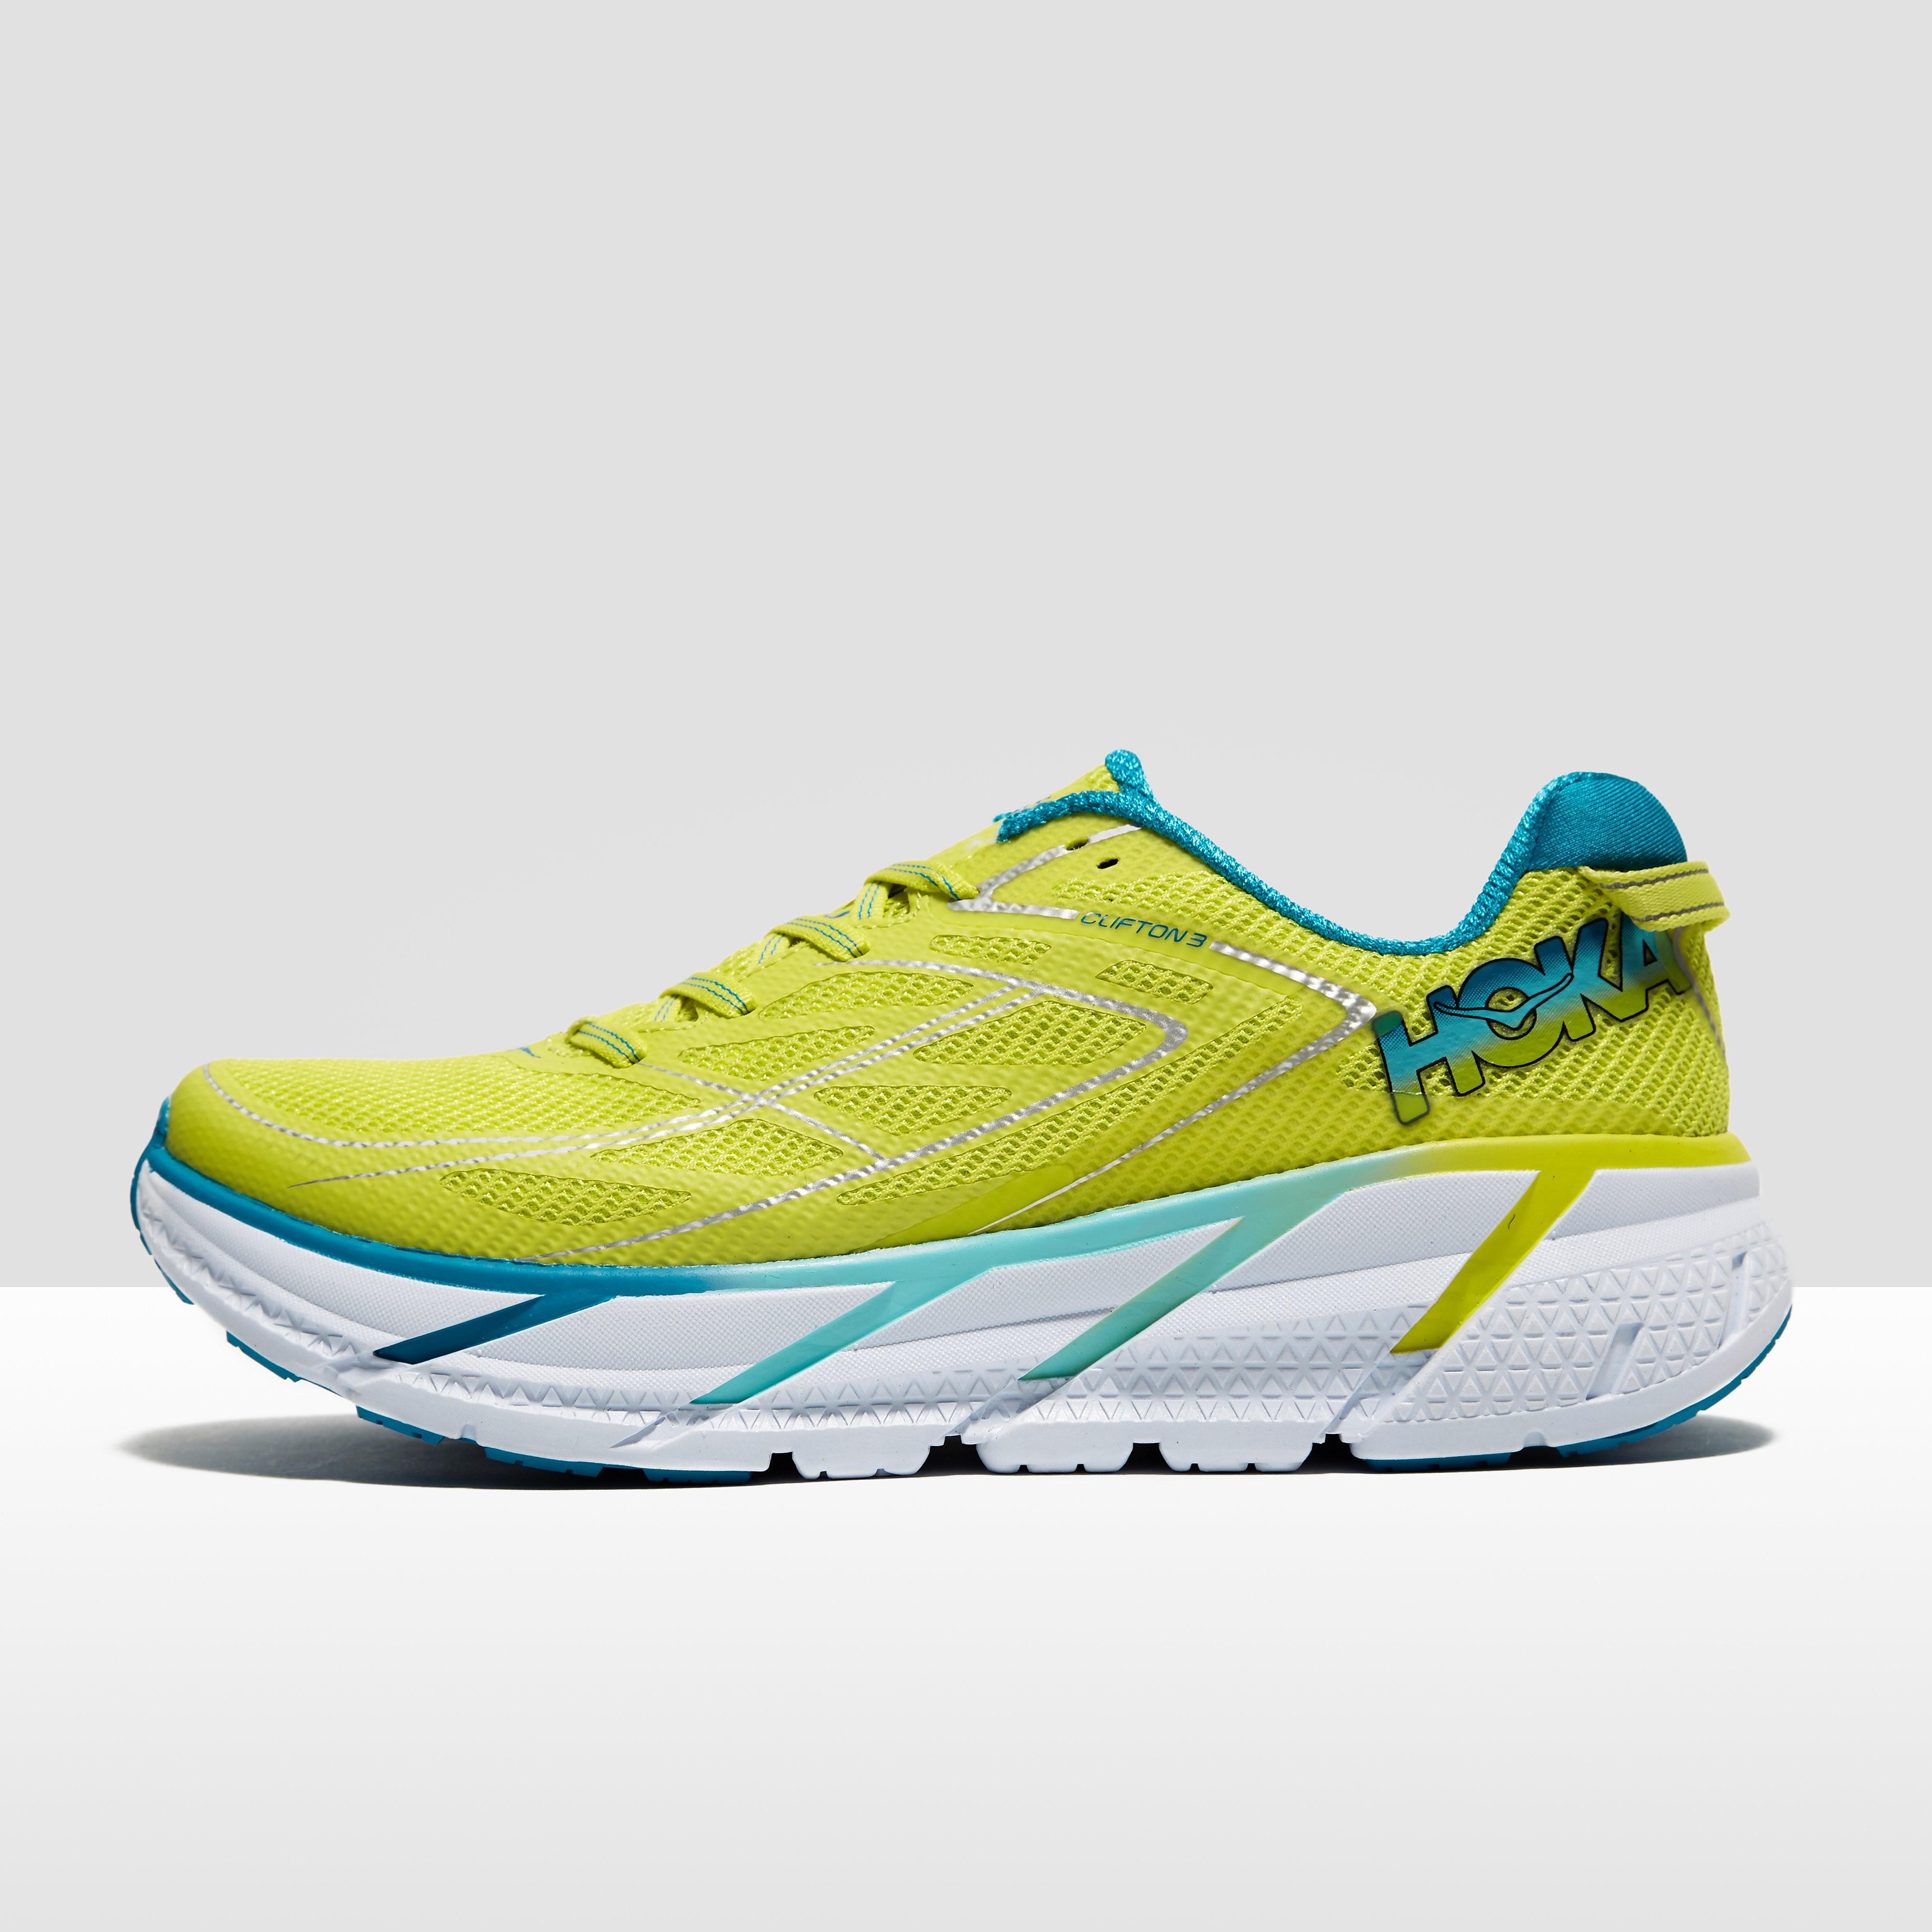 Hoka One One Clifton 3 Women's Running Shoes